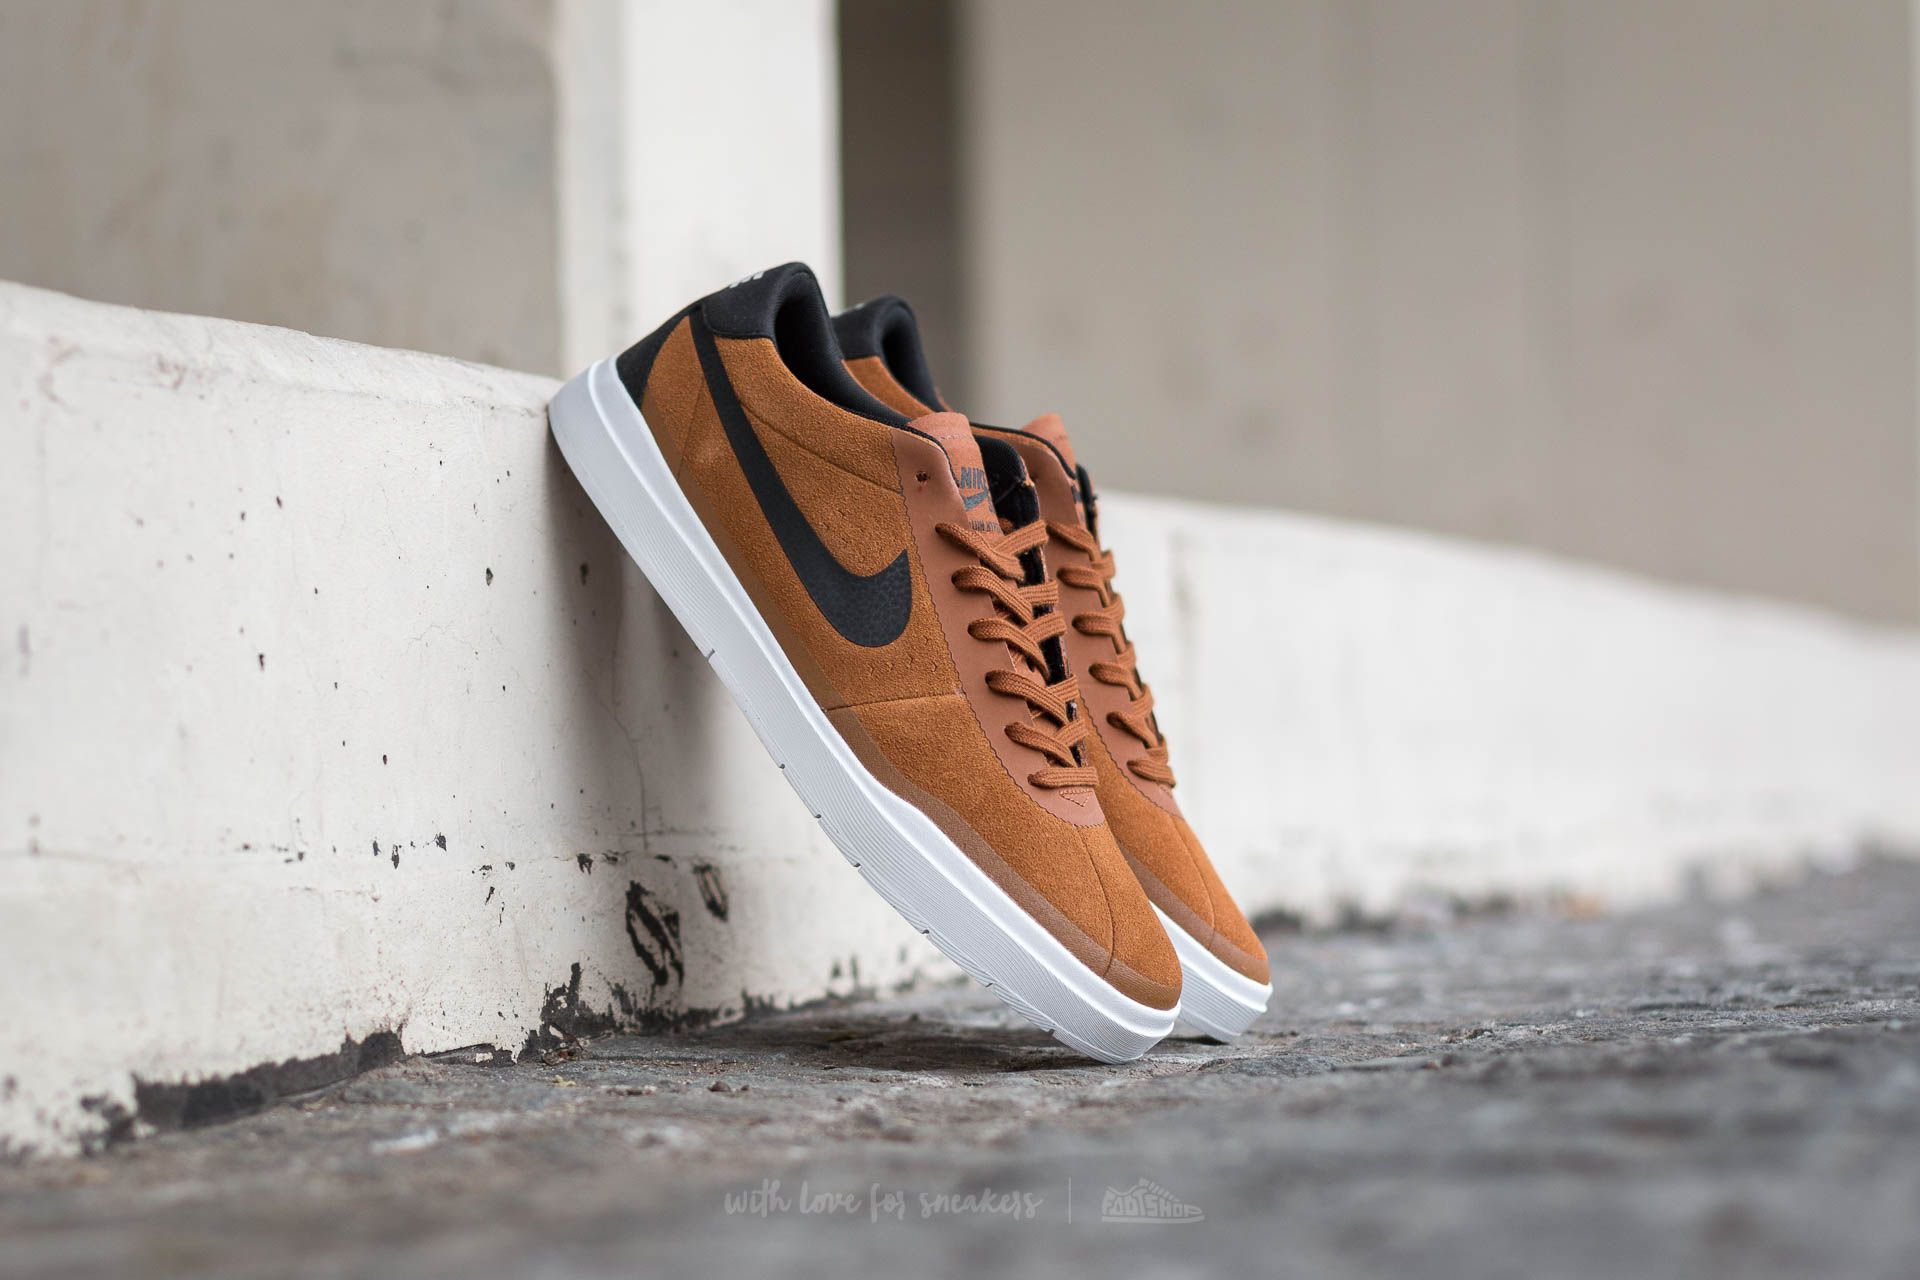 Montgomery Más temprano carga  Men's shoes Nike Bruin SB Hyperfeel Hazelnut/ Black-White   Footshop